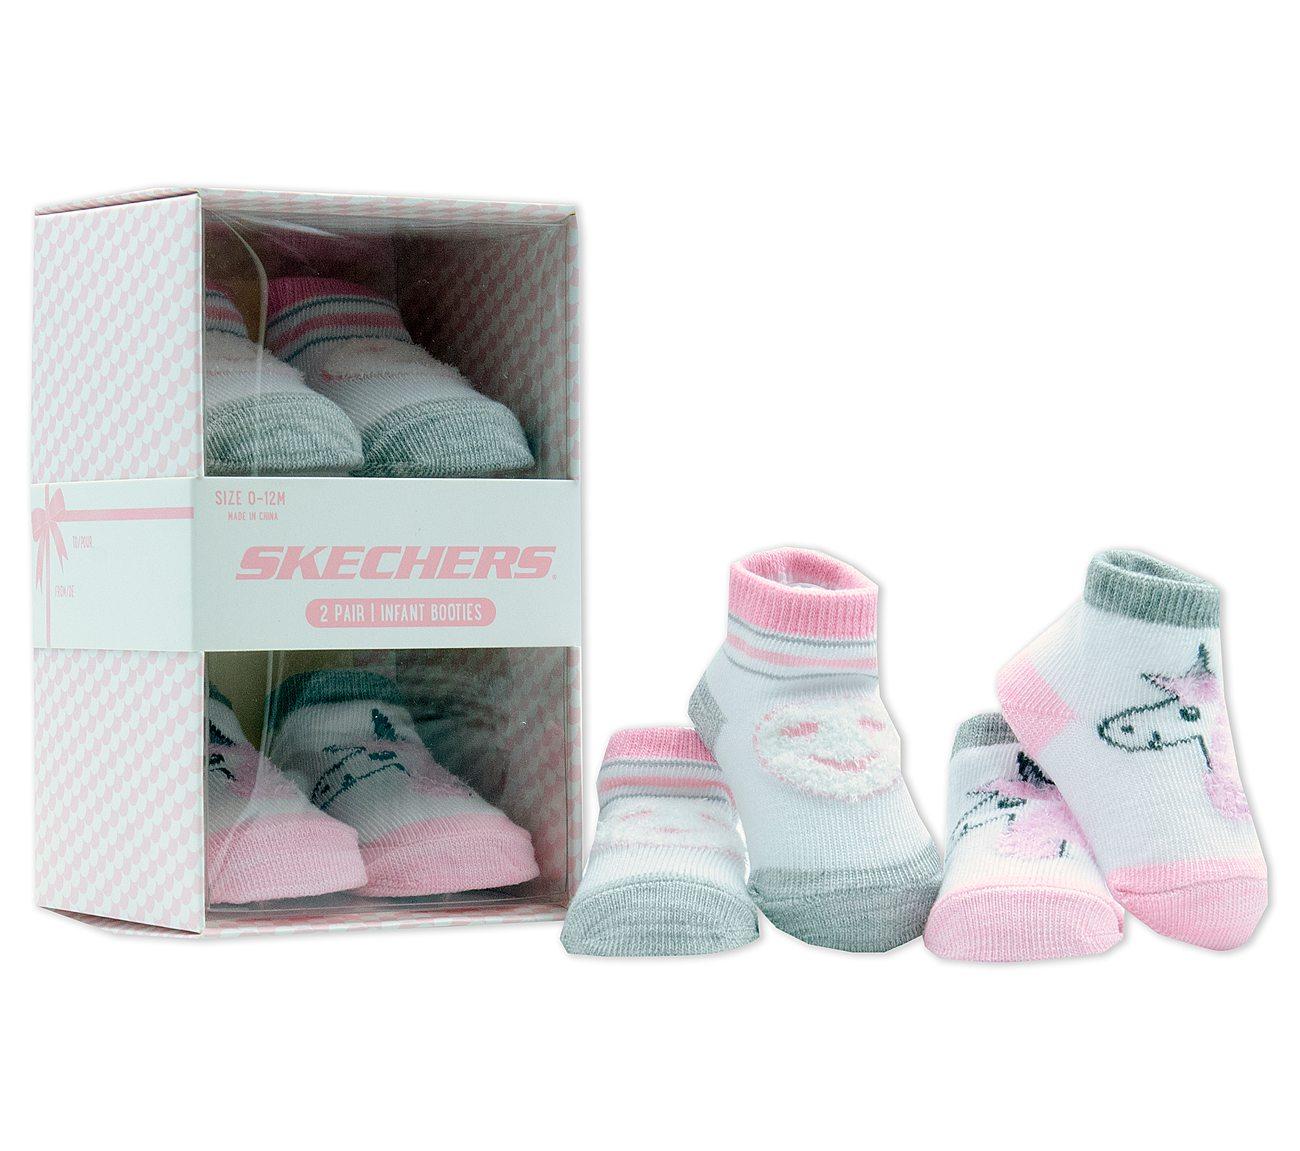 2 Pack Infant Sock Booties